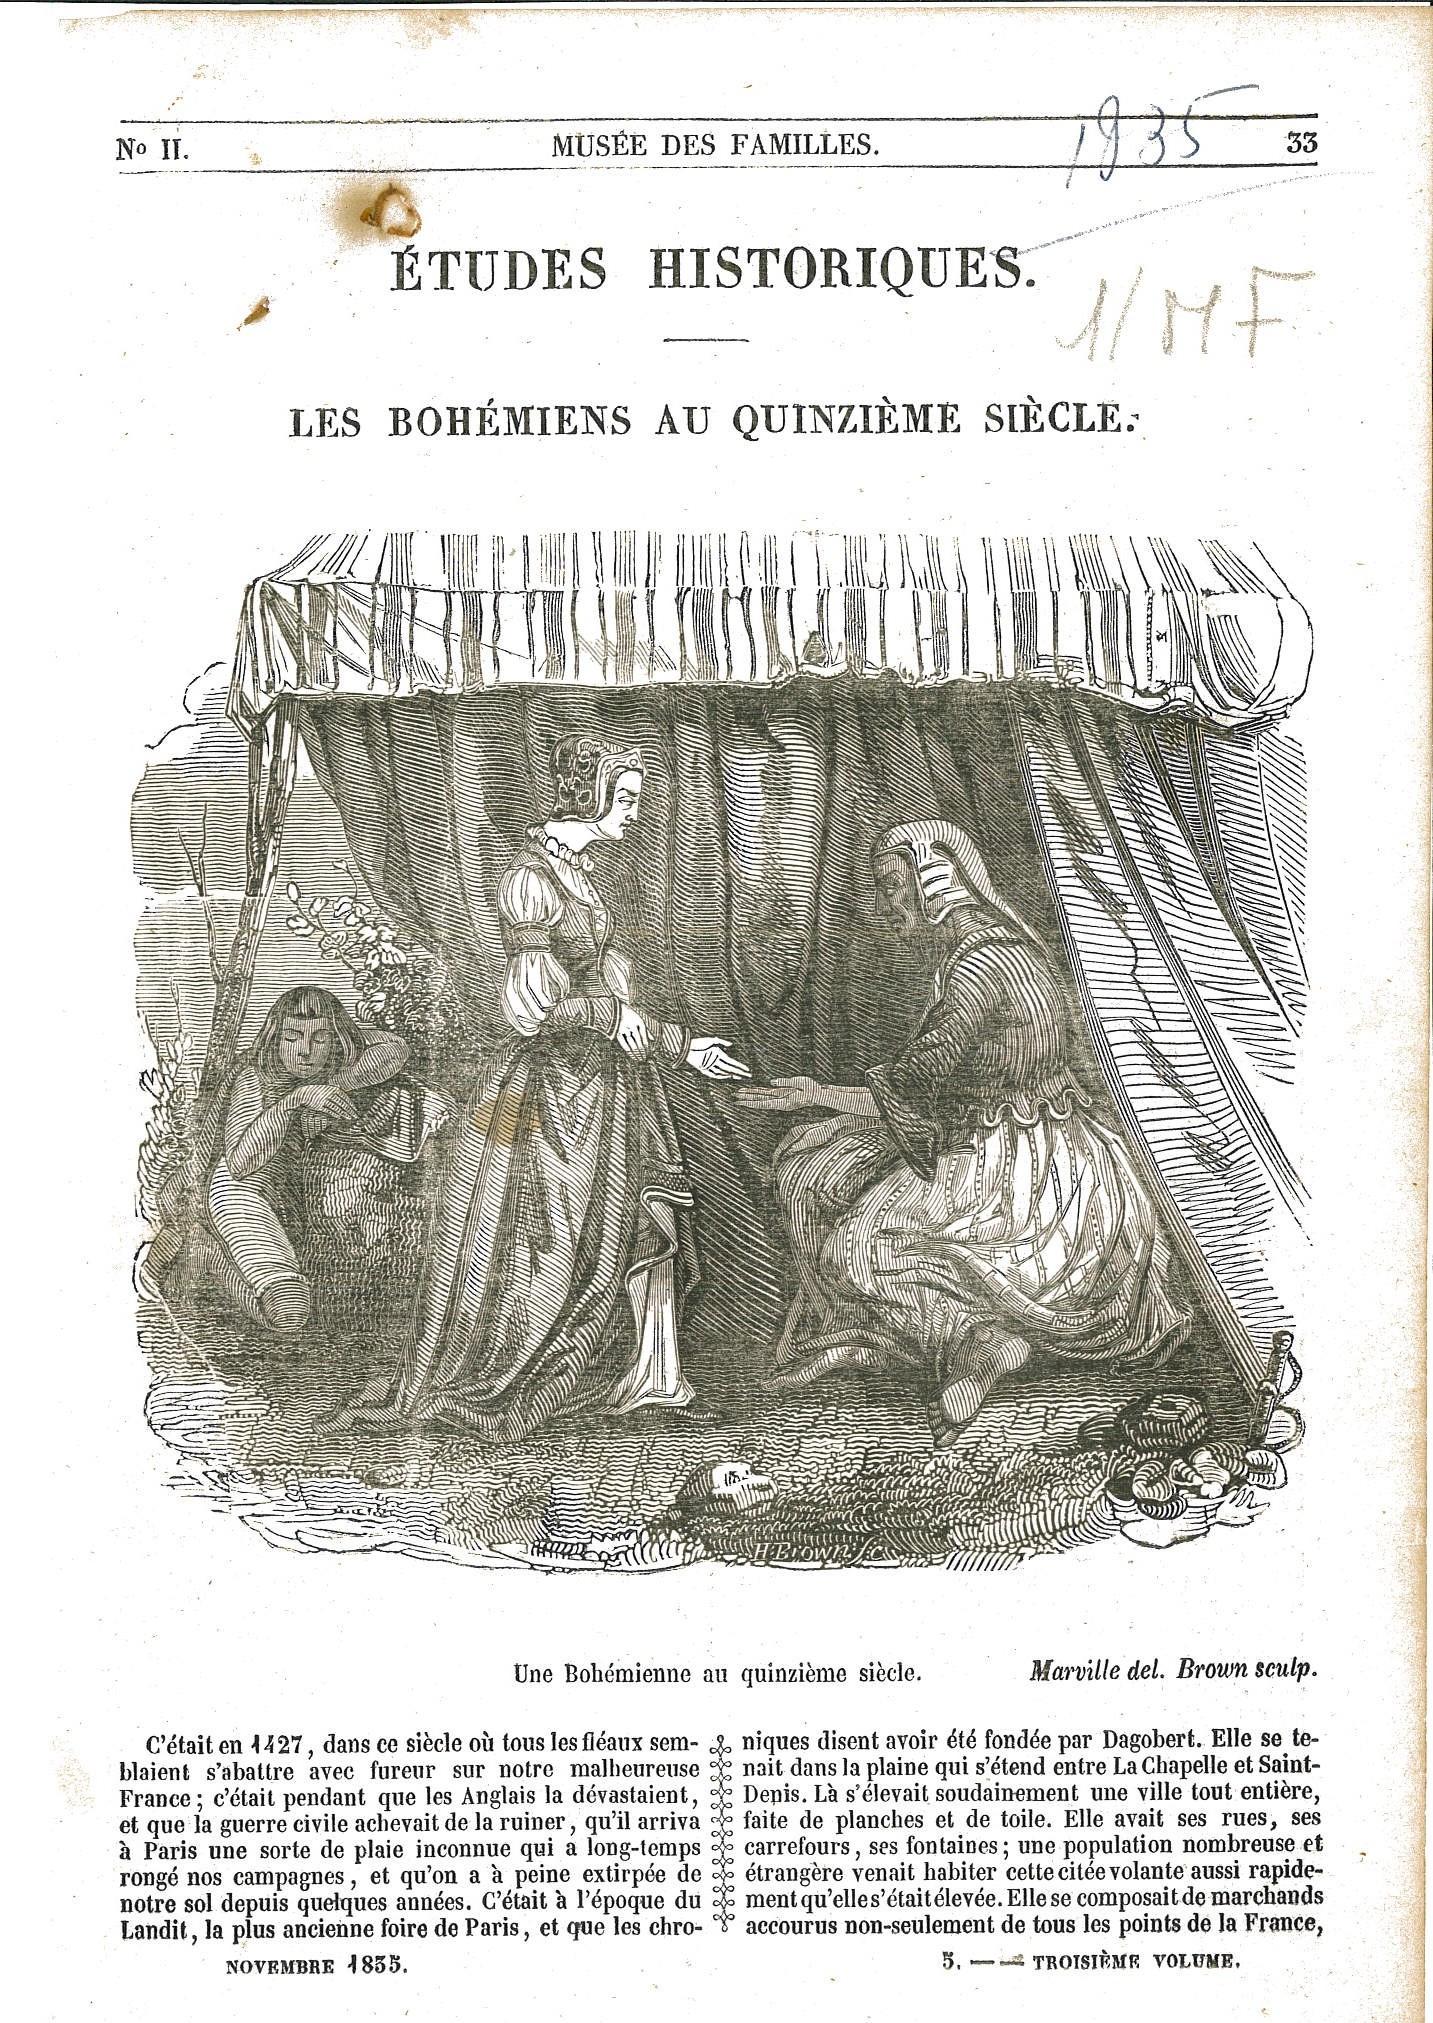 p.33.jpg - image/jpeg